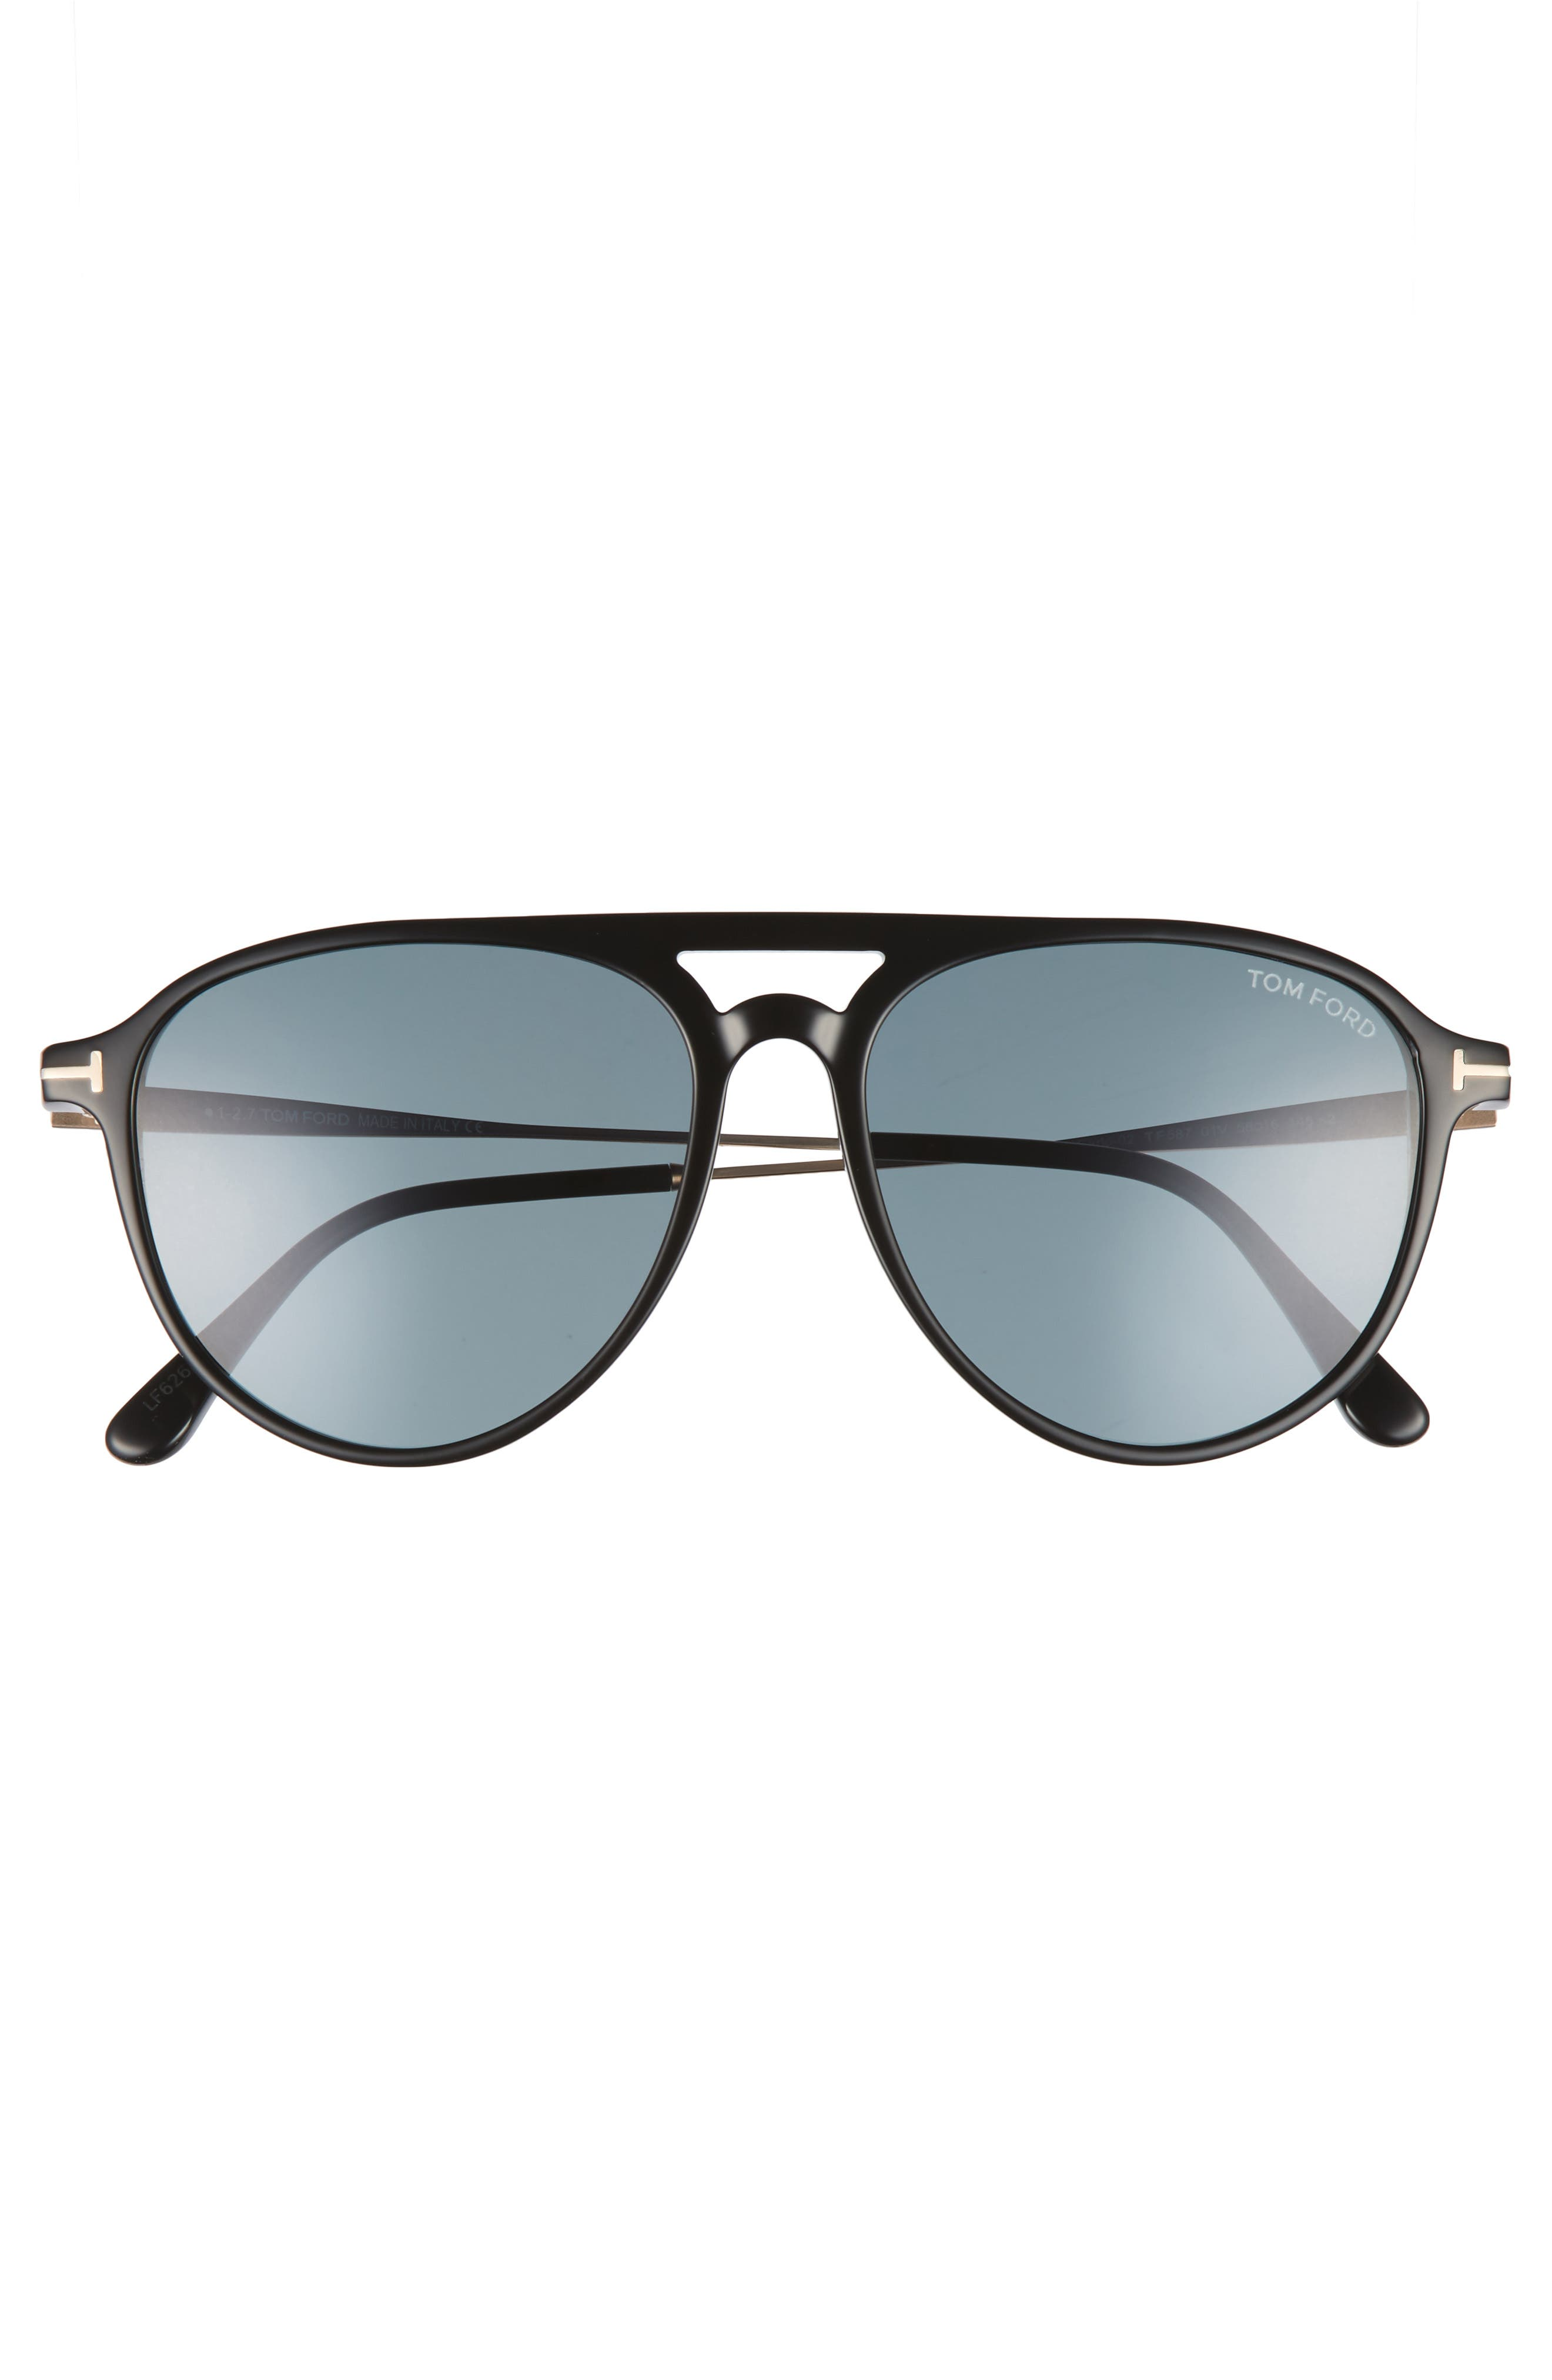 Carlo 59mm Aviator Sunglasses,                             Alternate thumbnail 2, color,                             001